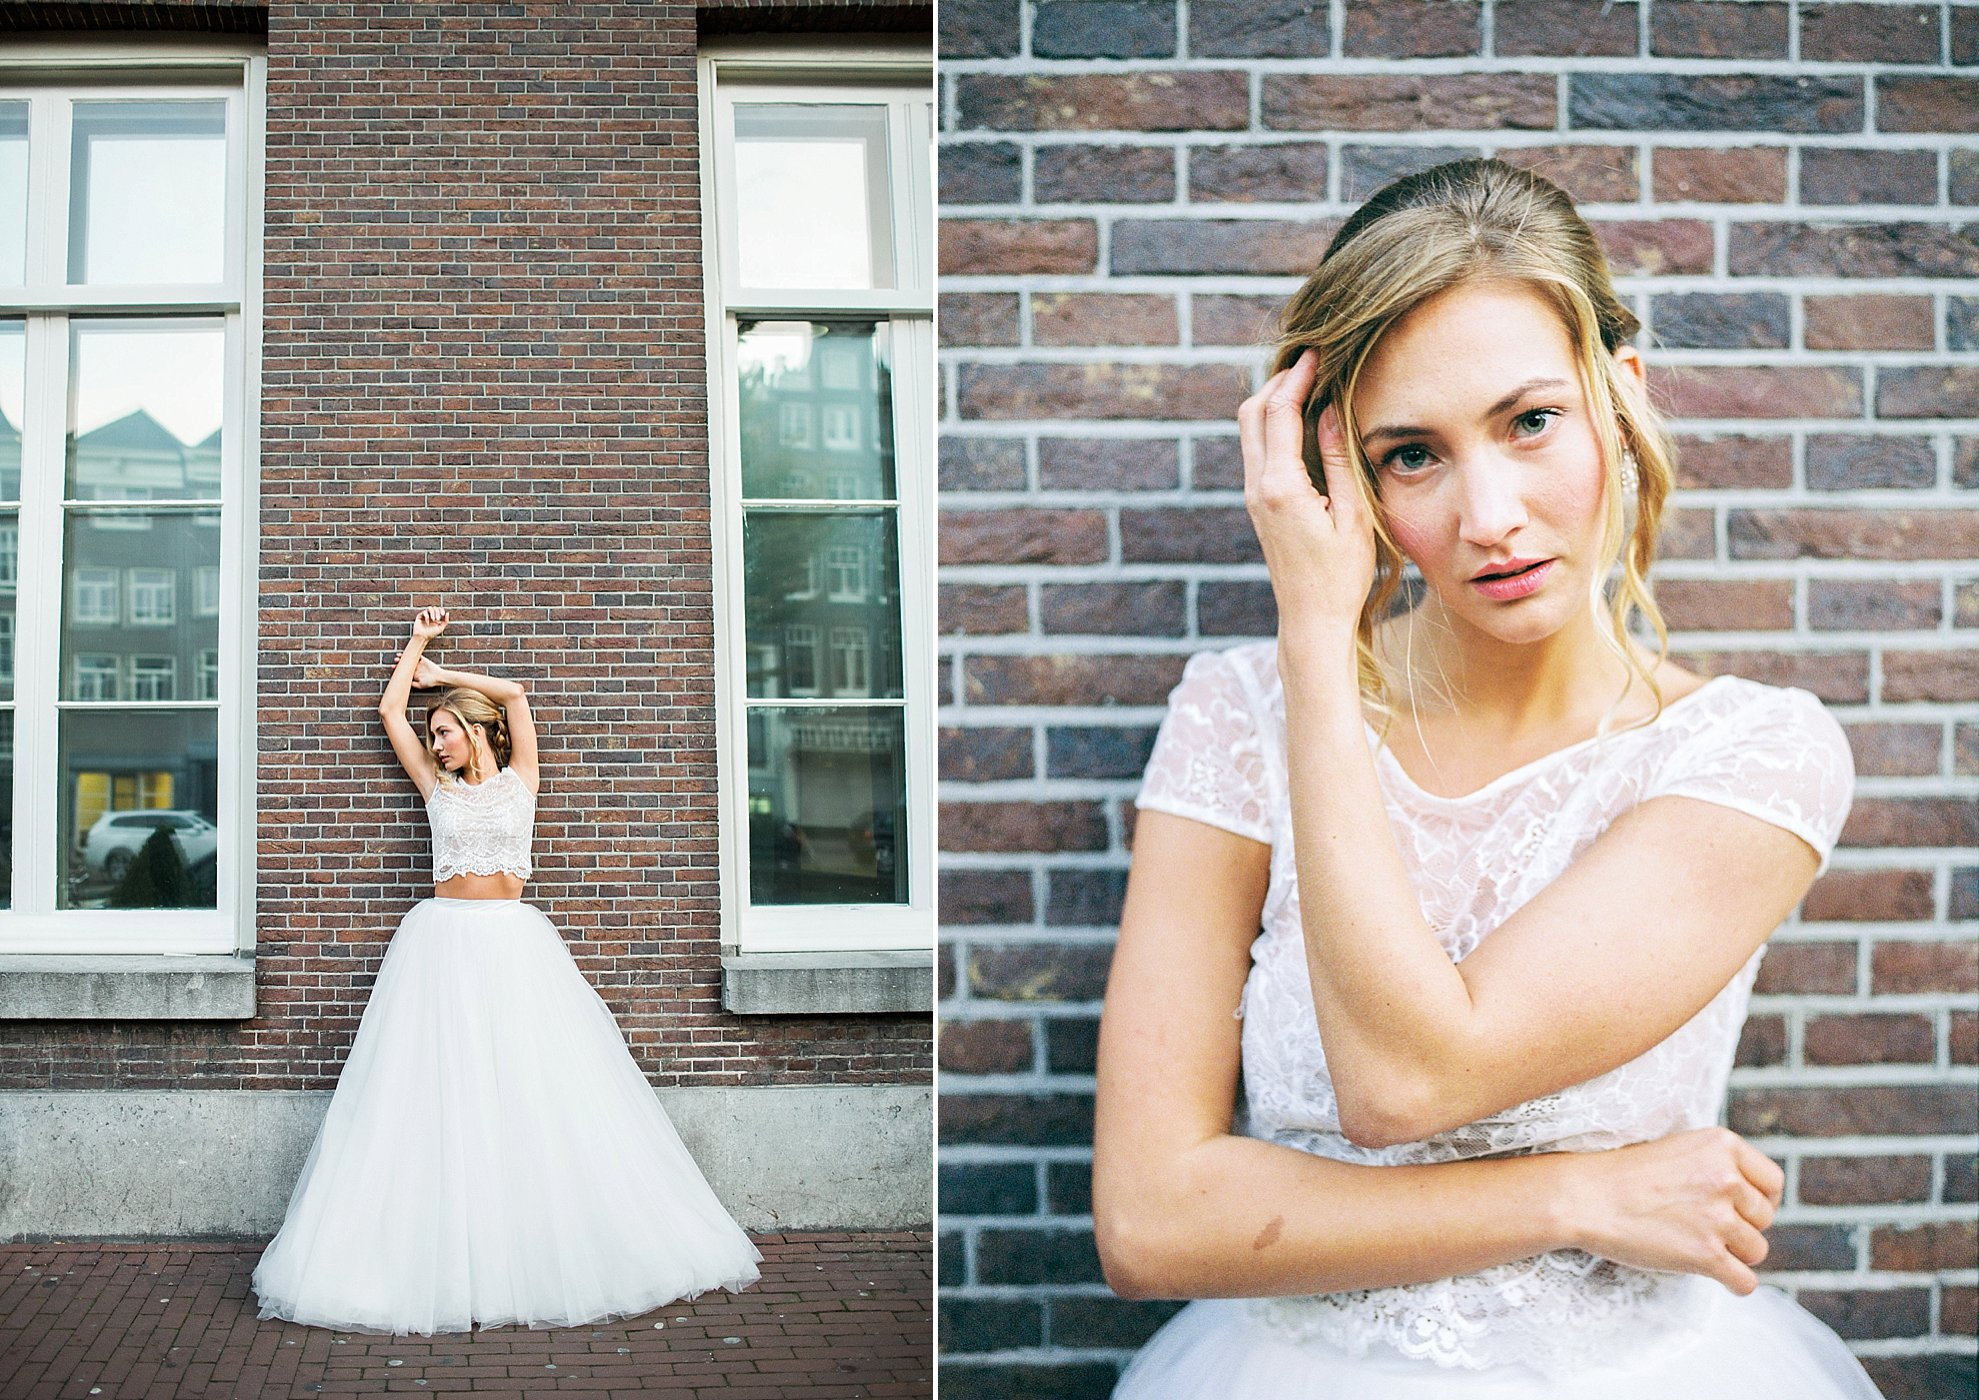 Amanda-Drost-fotografie-fashion.jpg